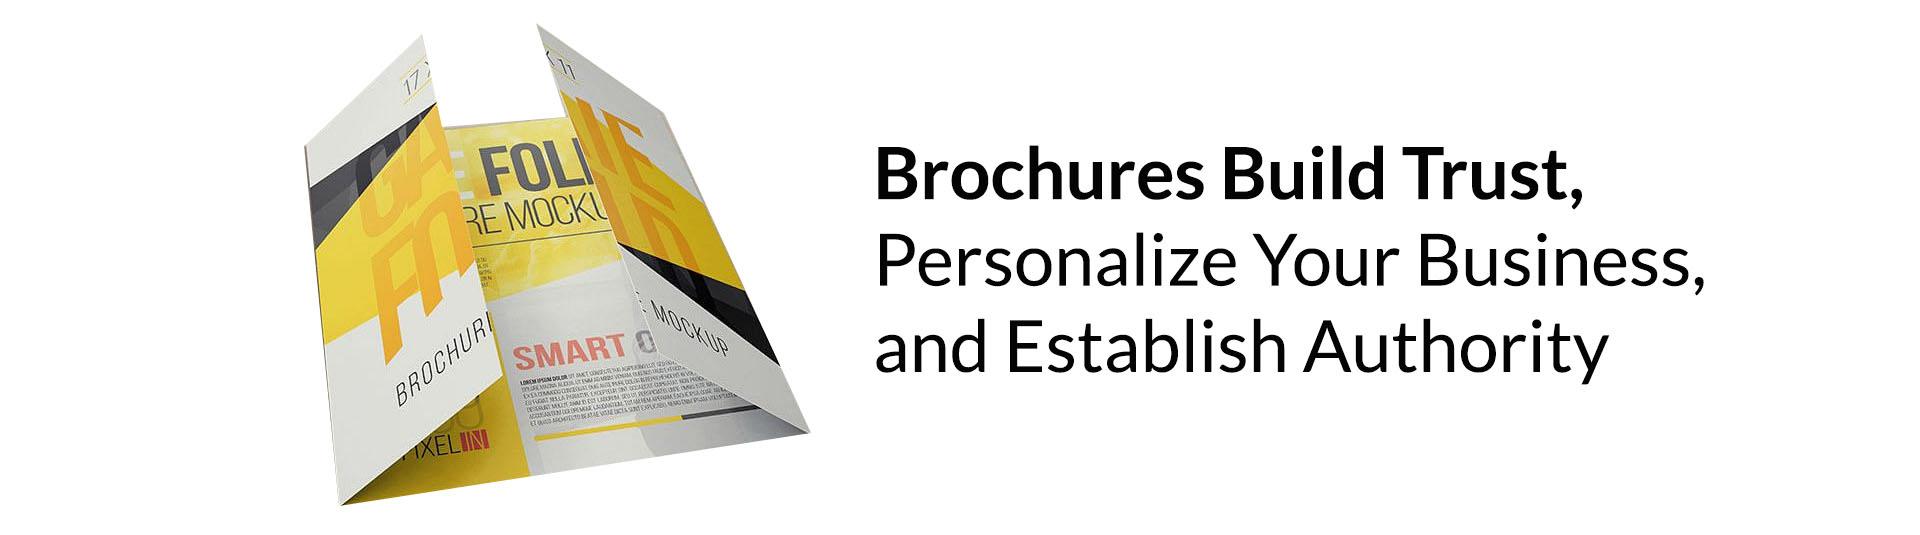 business company brochure design in greenville